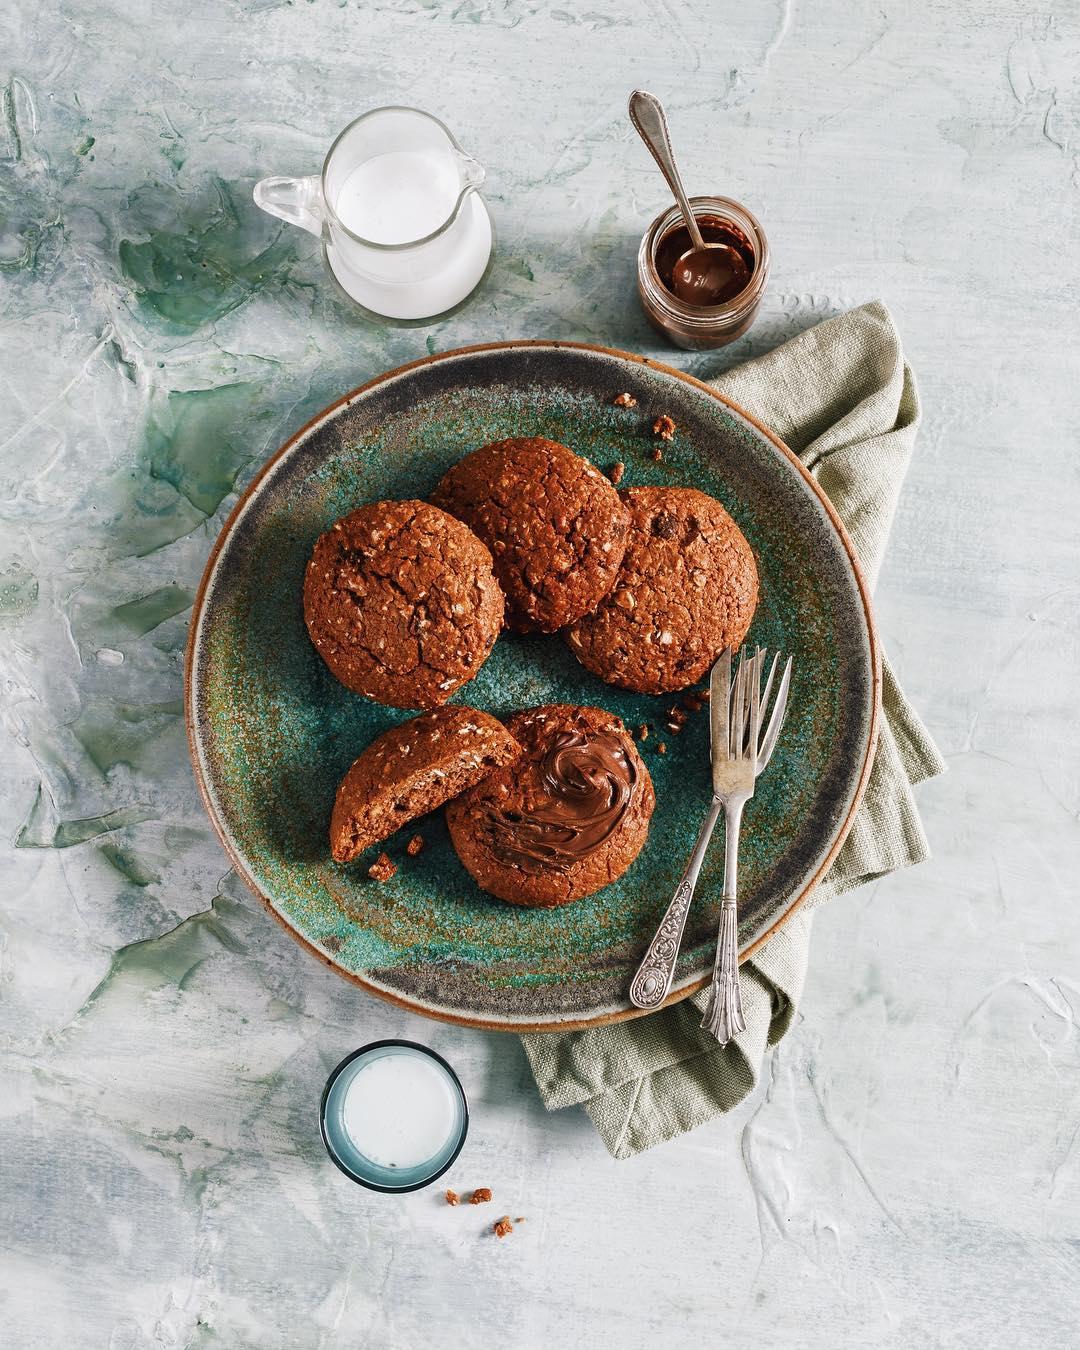 Youtella Cookies - Kasia Sykus ©